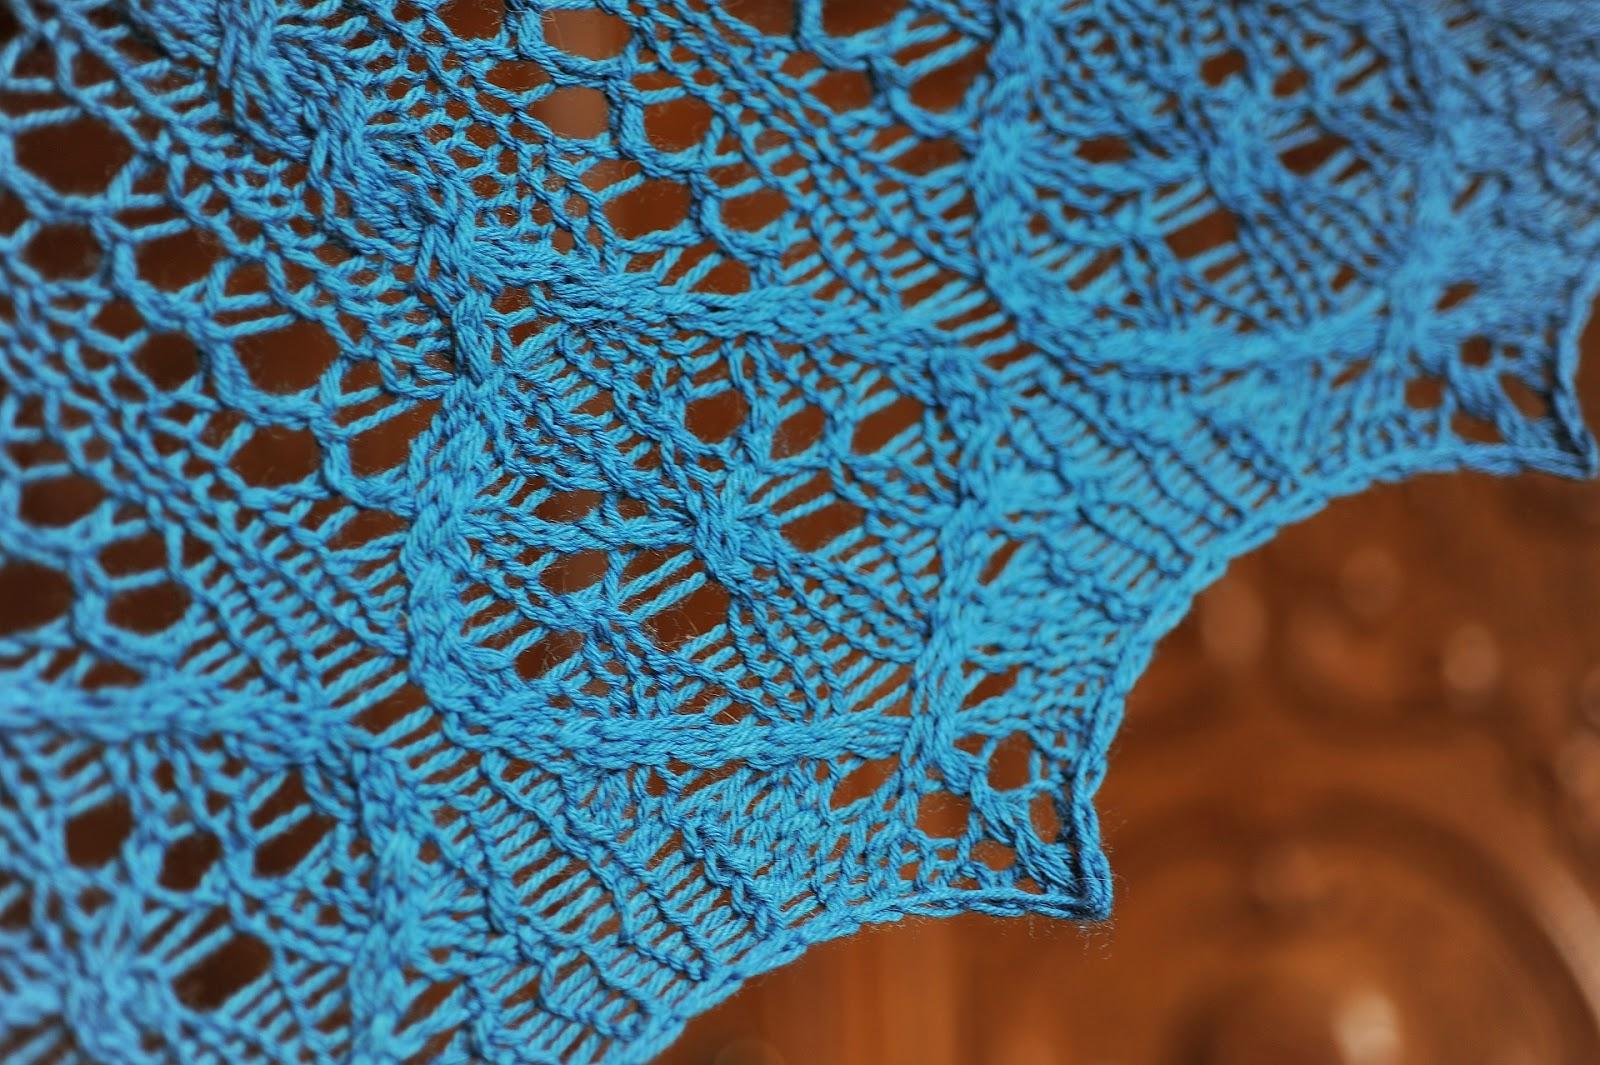 http://allshadesofblue78.blogspot.com/2014/03/verity-shawl-oraz-wspolne-czytanie.html